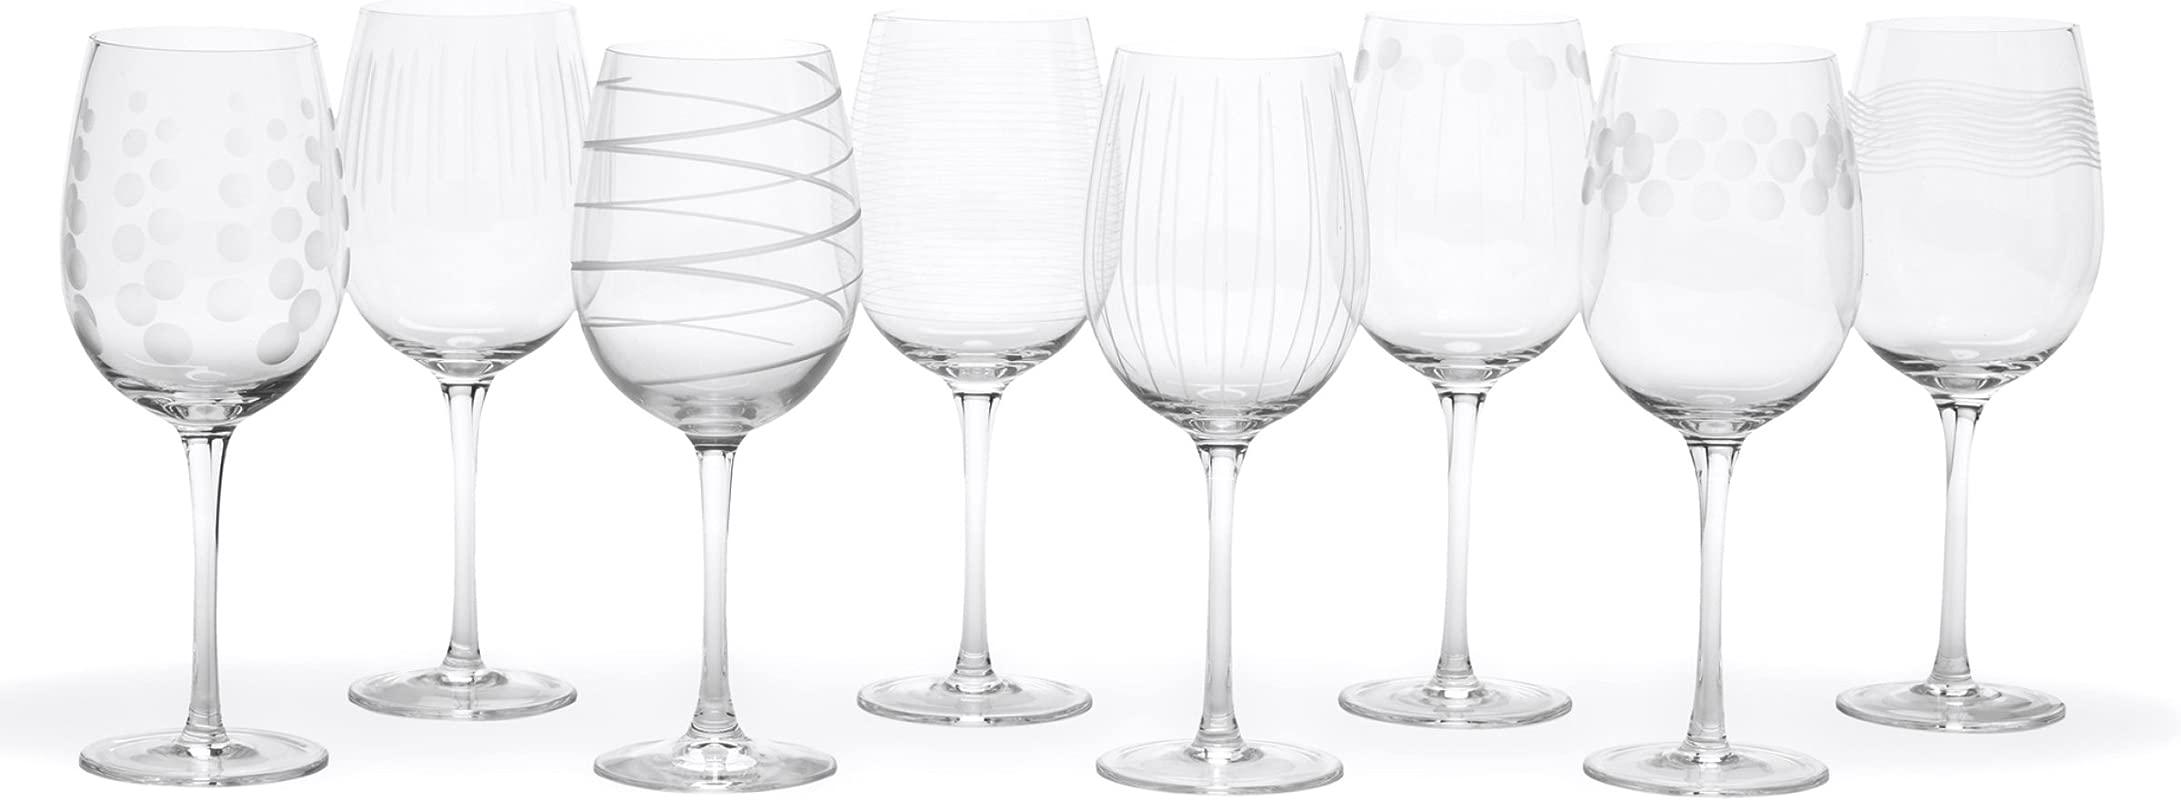 Mikasa Cheers White Wine Glasses 16 Ounce Set Of 8